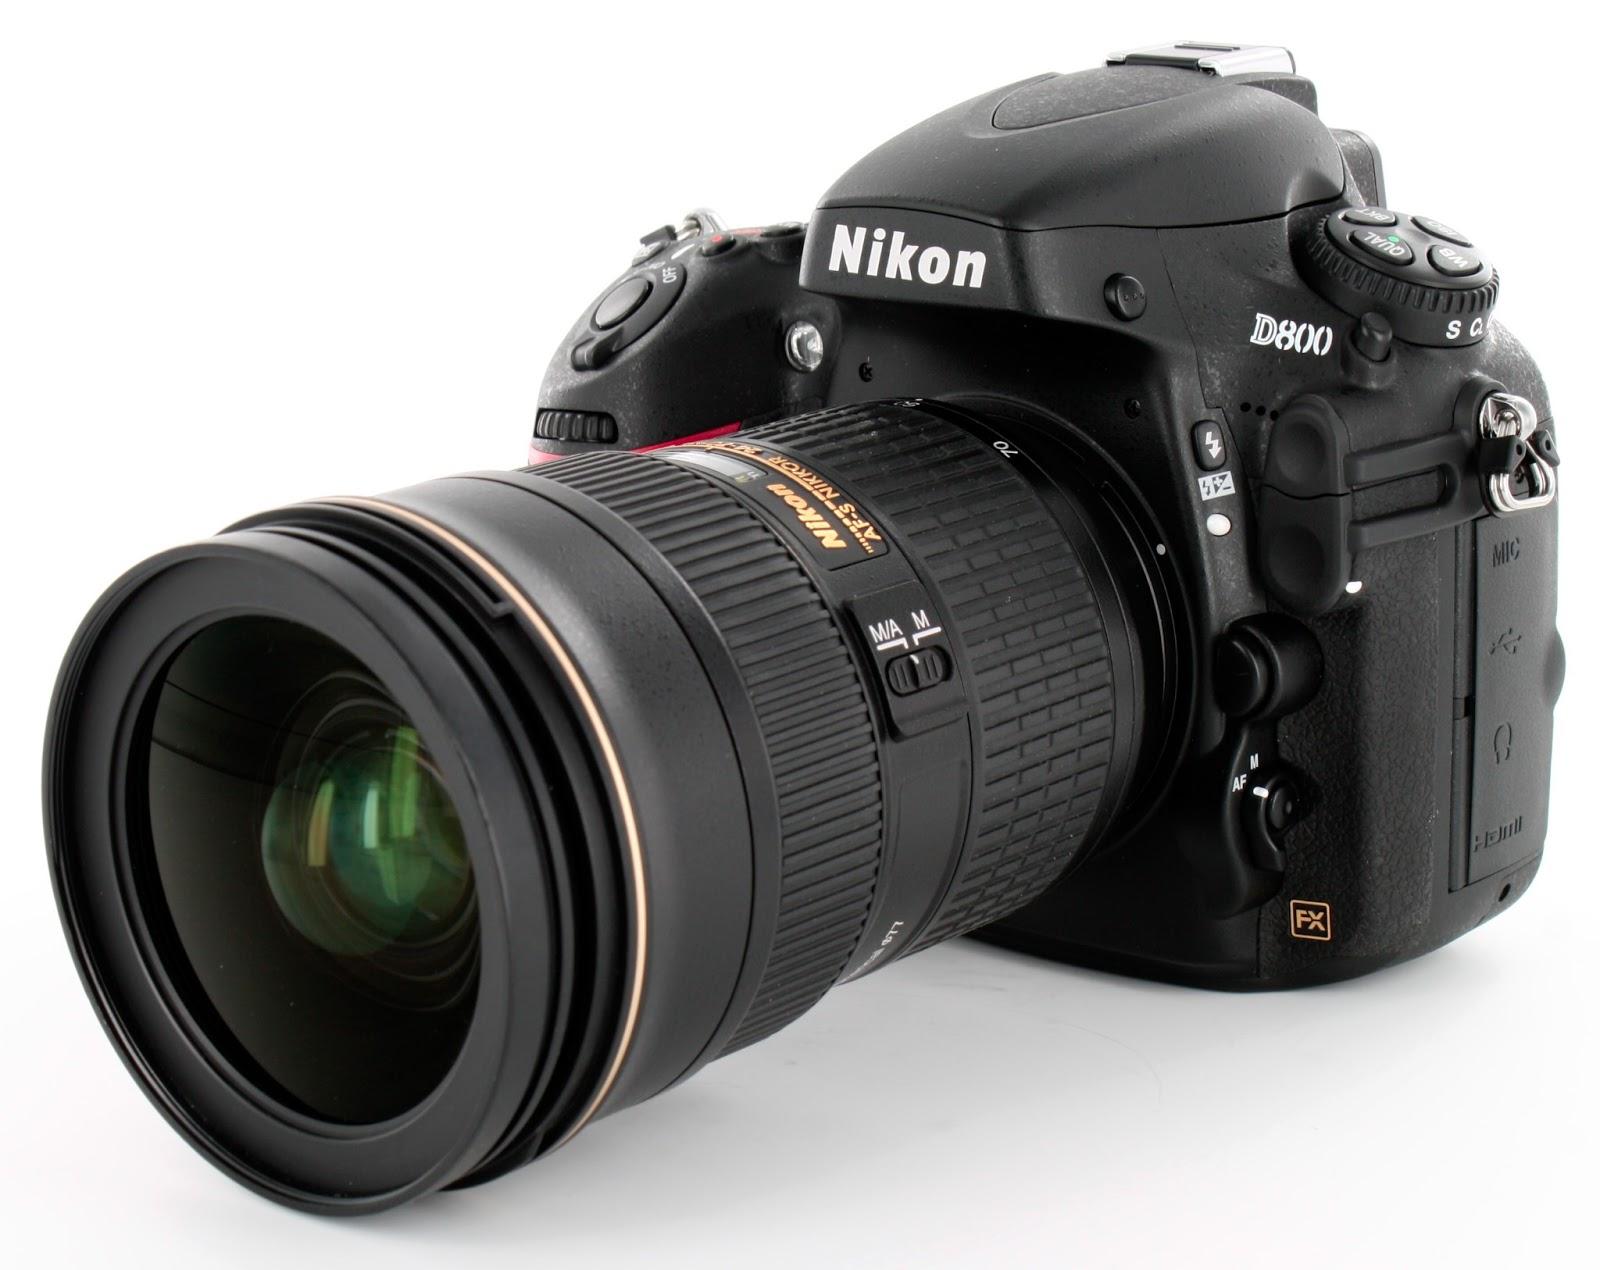 Nikon D800 Full Frame Camera | Digital Camera and Gadget Reviews